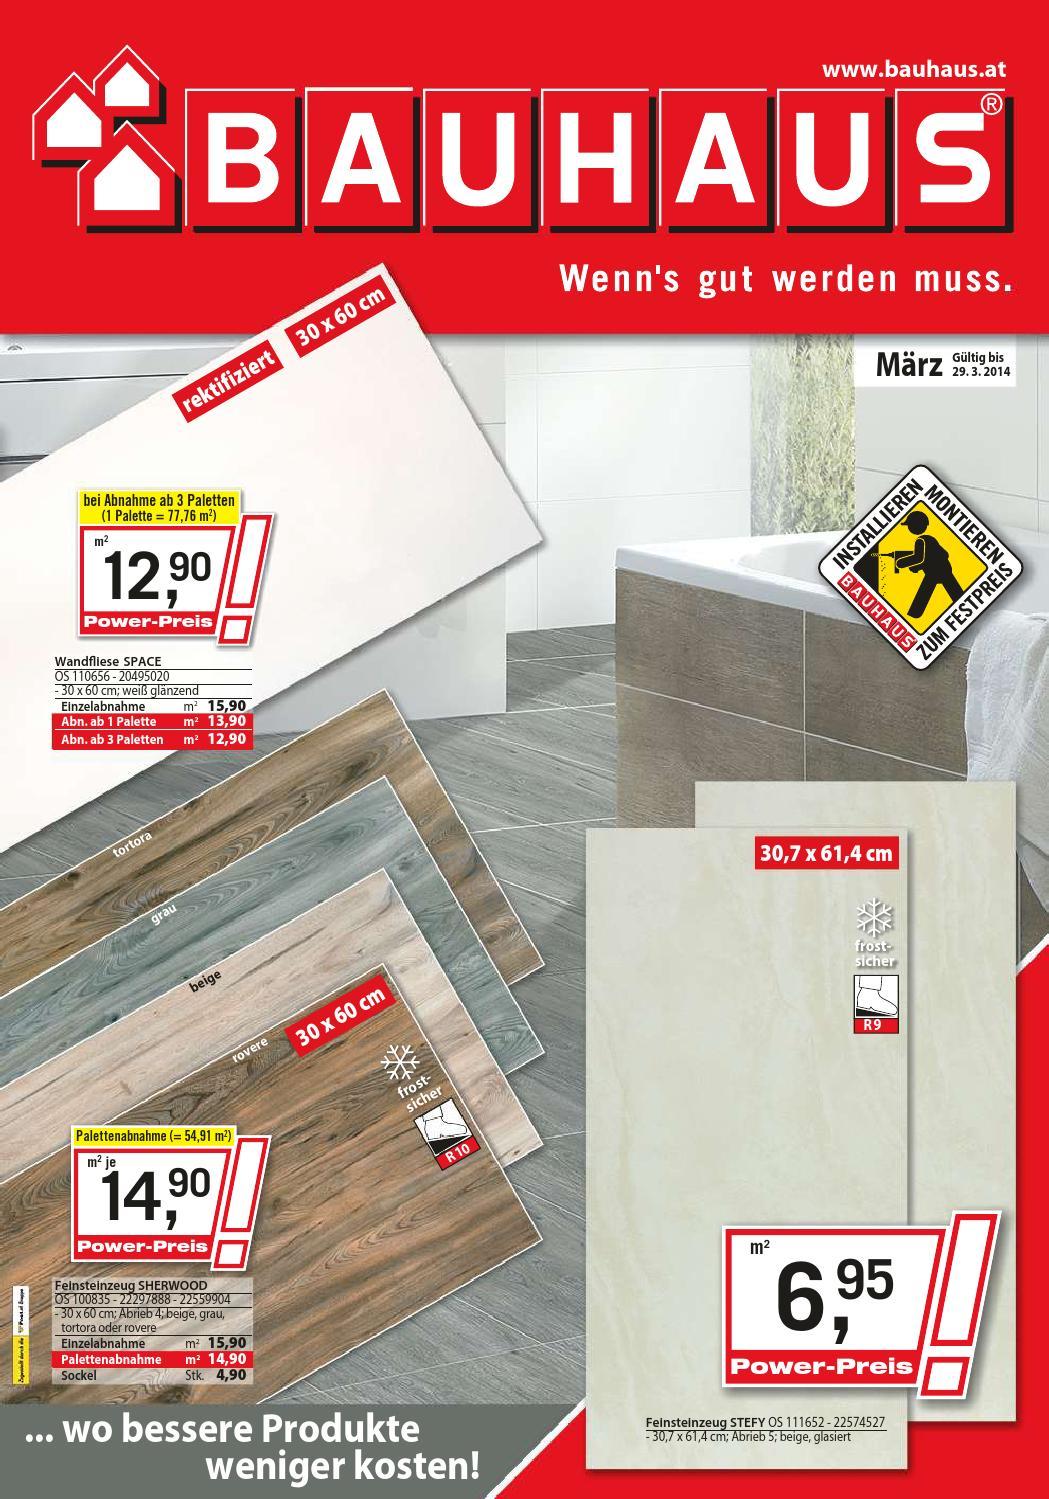 Bauhaus Angebote 3 29marz2014 By Promoangebote At Issuu